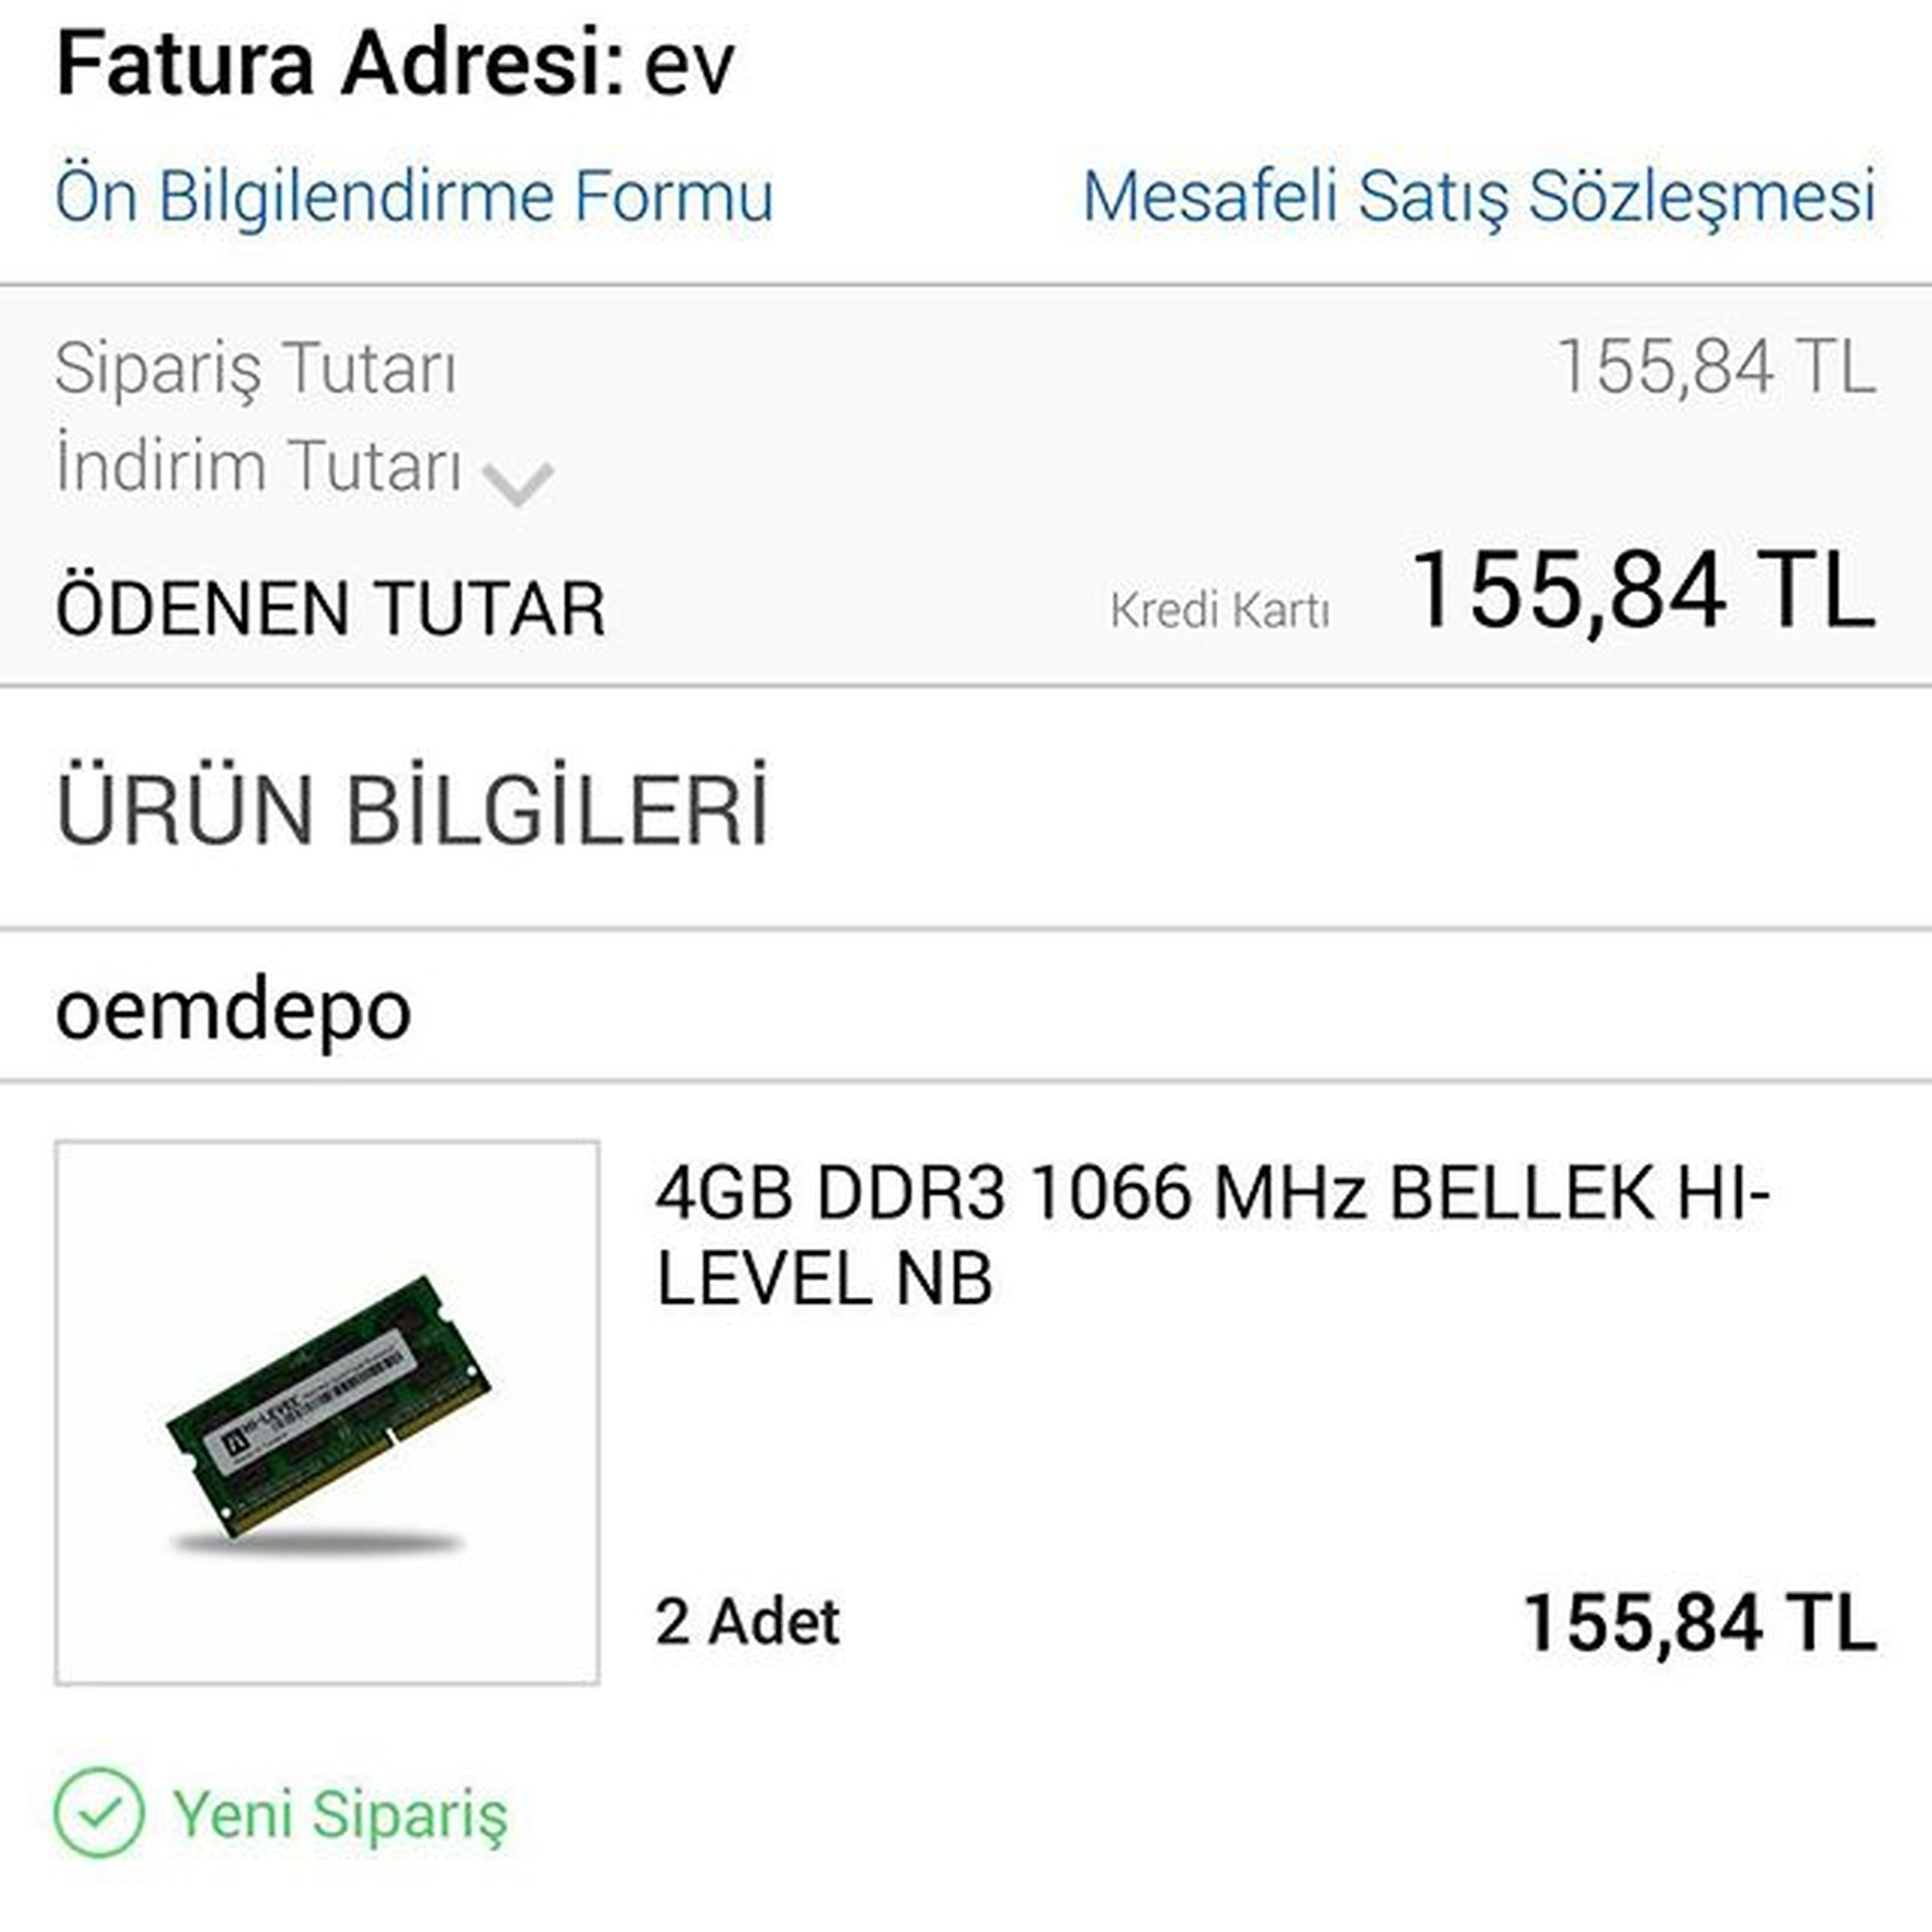 SSD den sonra az da RAM Upgrade edelim. Hilevel 8gb 4x2kit macbookpro teknotwit